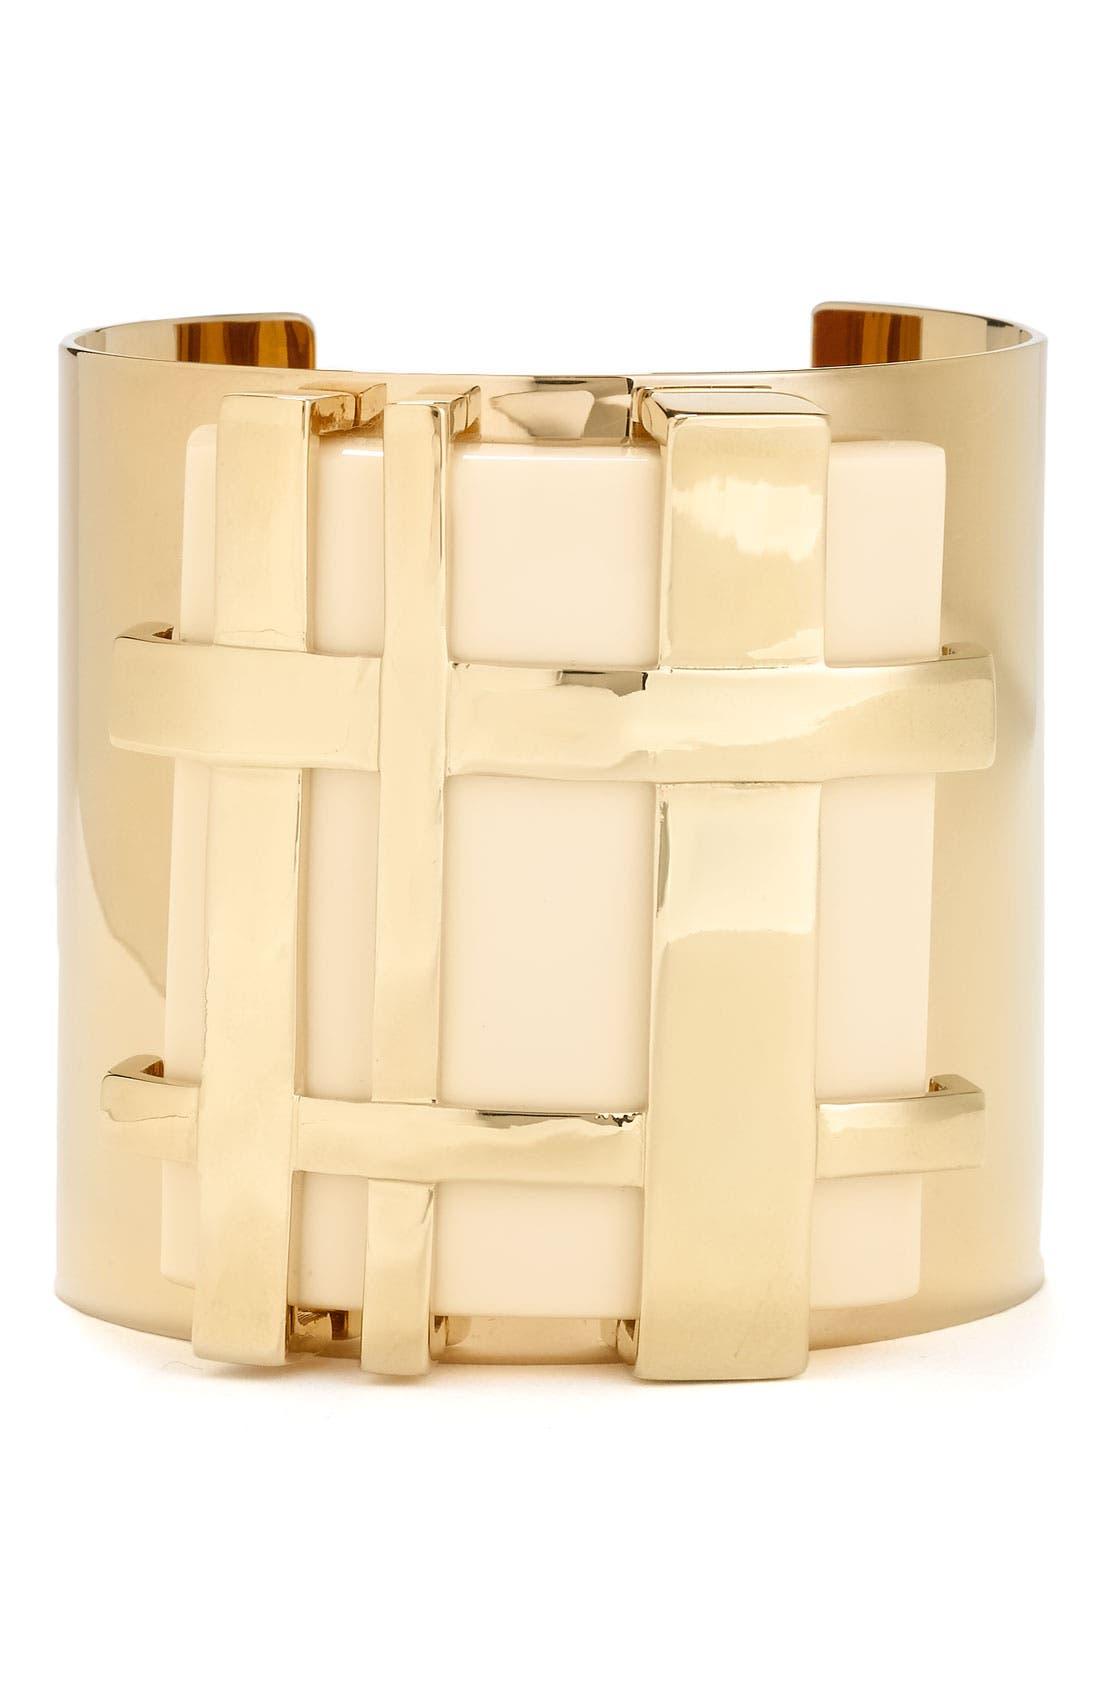 Alternate Image 1 Selected - Tory Burch 'Gingham' Cuff Bracelet